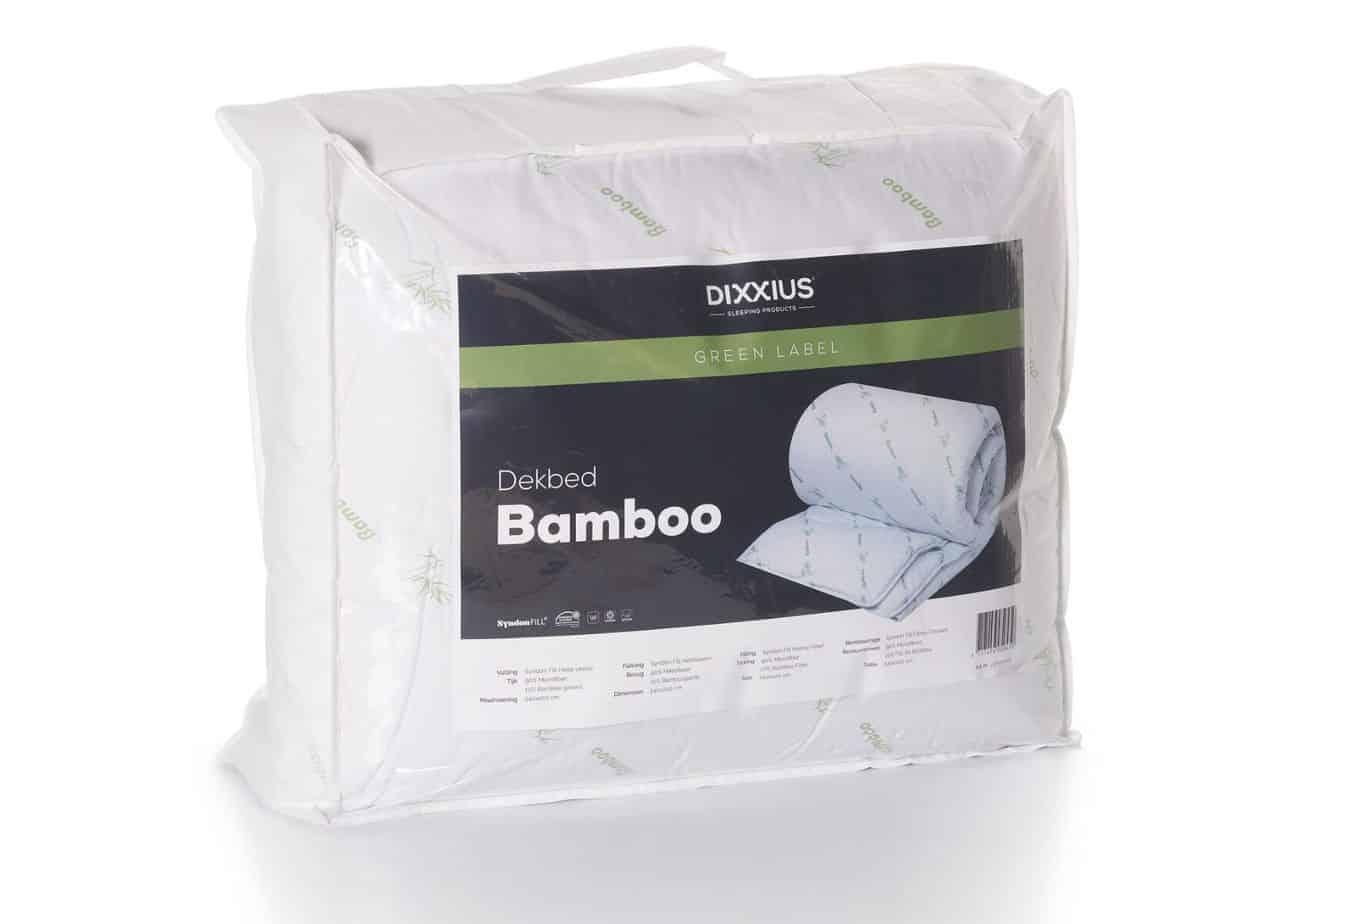 Dixxius Dekbed Bamboo